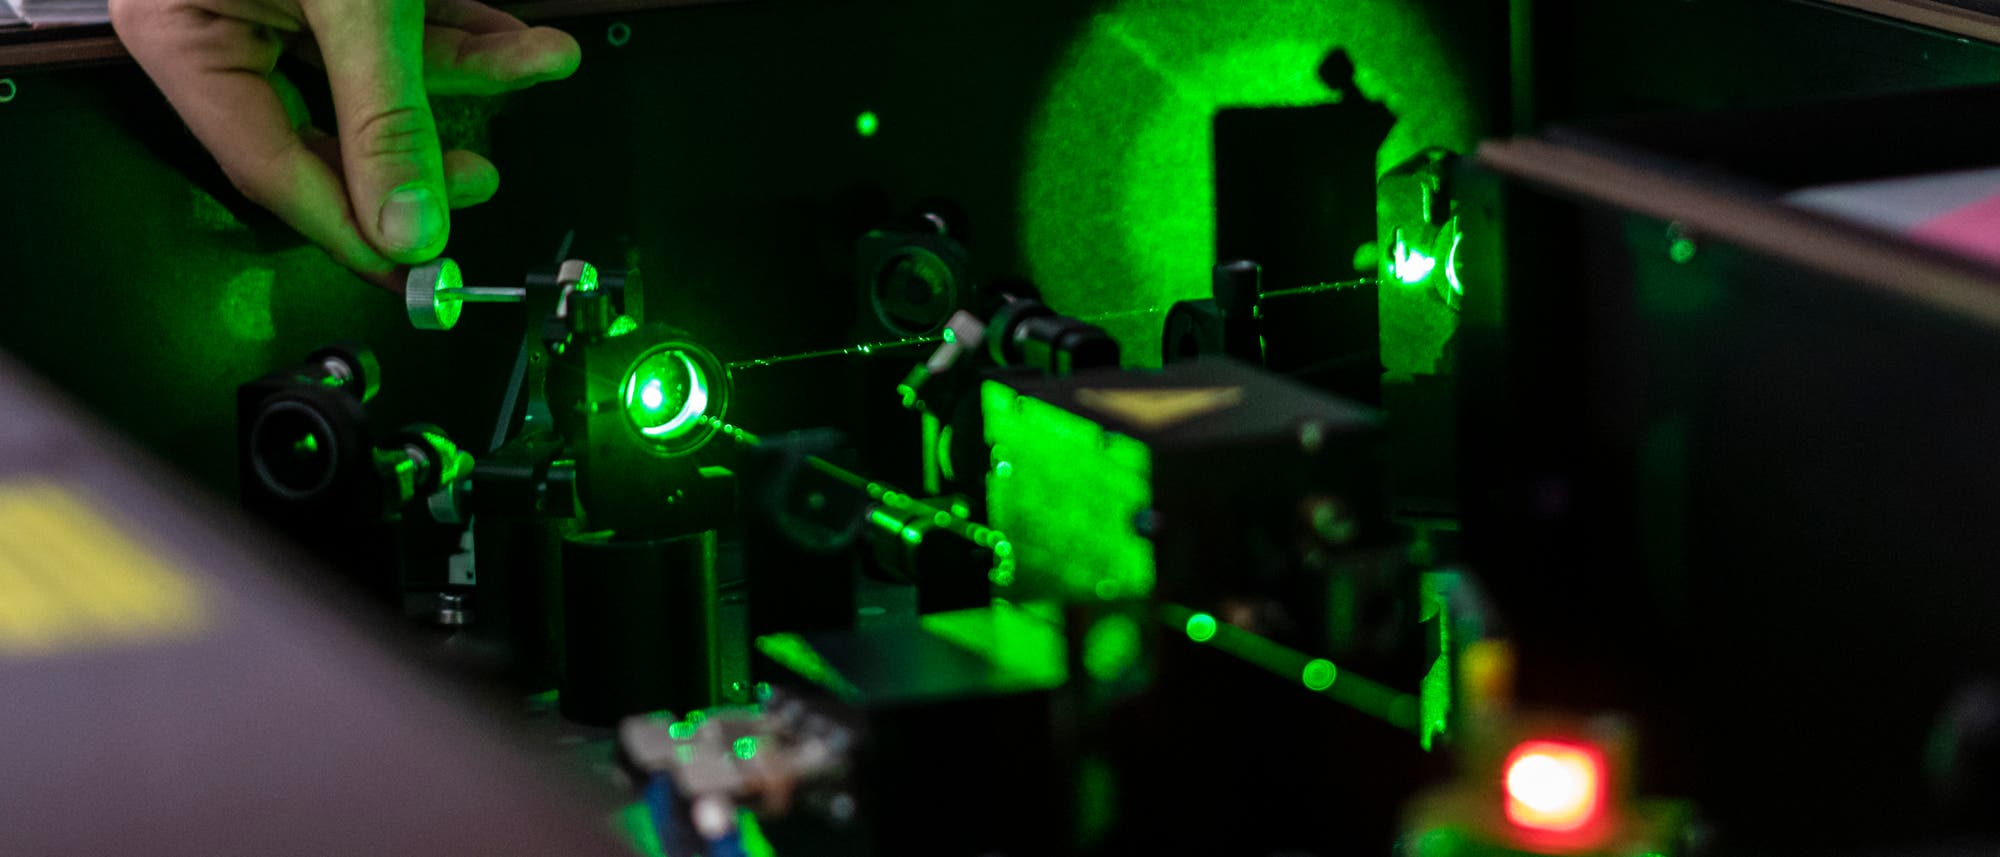 Wer bekommt den Nobelpreis für Physik 2021?